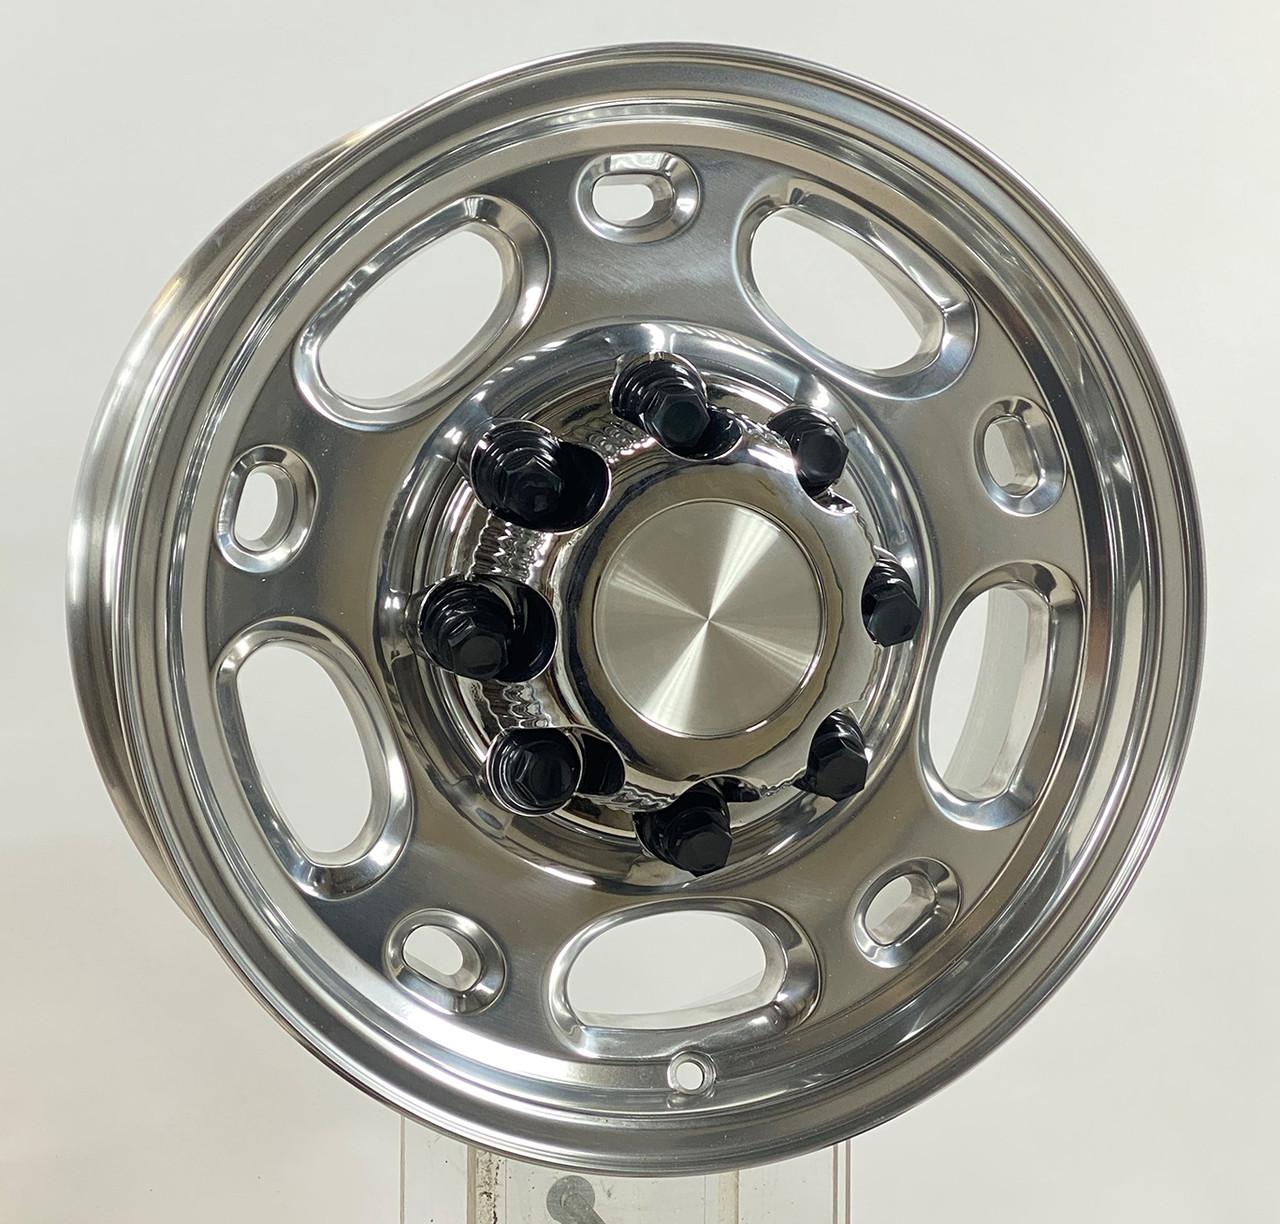 Chevrolet Chevy Silverado 2500 3500 Epress Van 16 8 LUG WHEEL CHROME hub caps CENTER SET